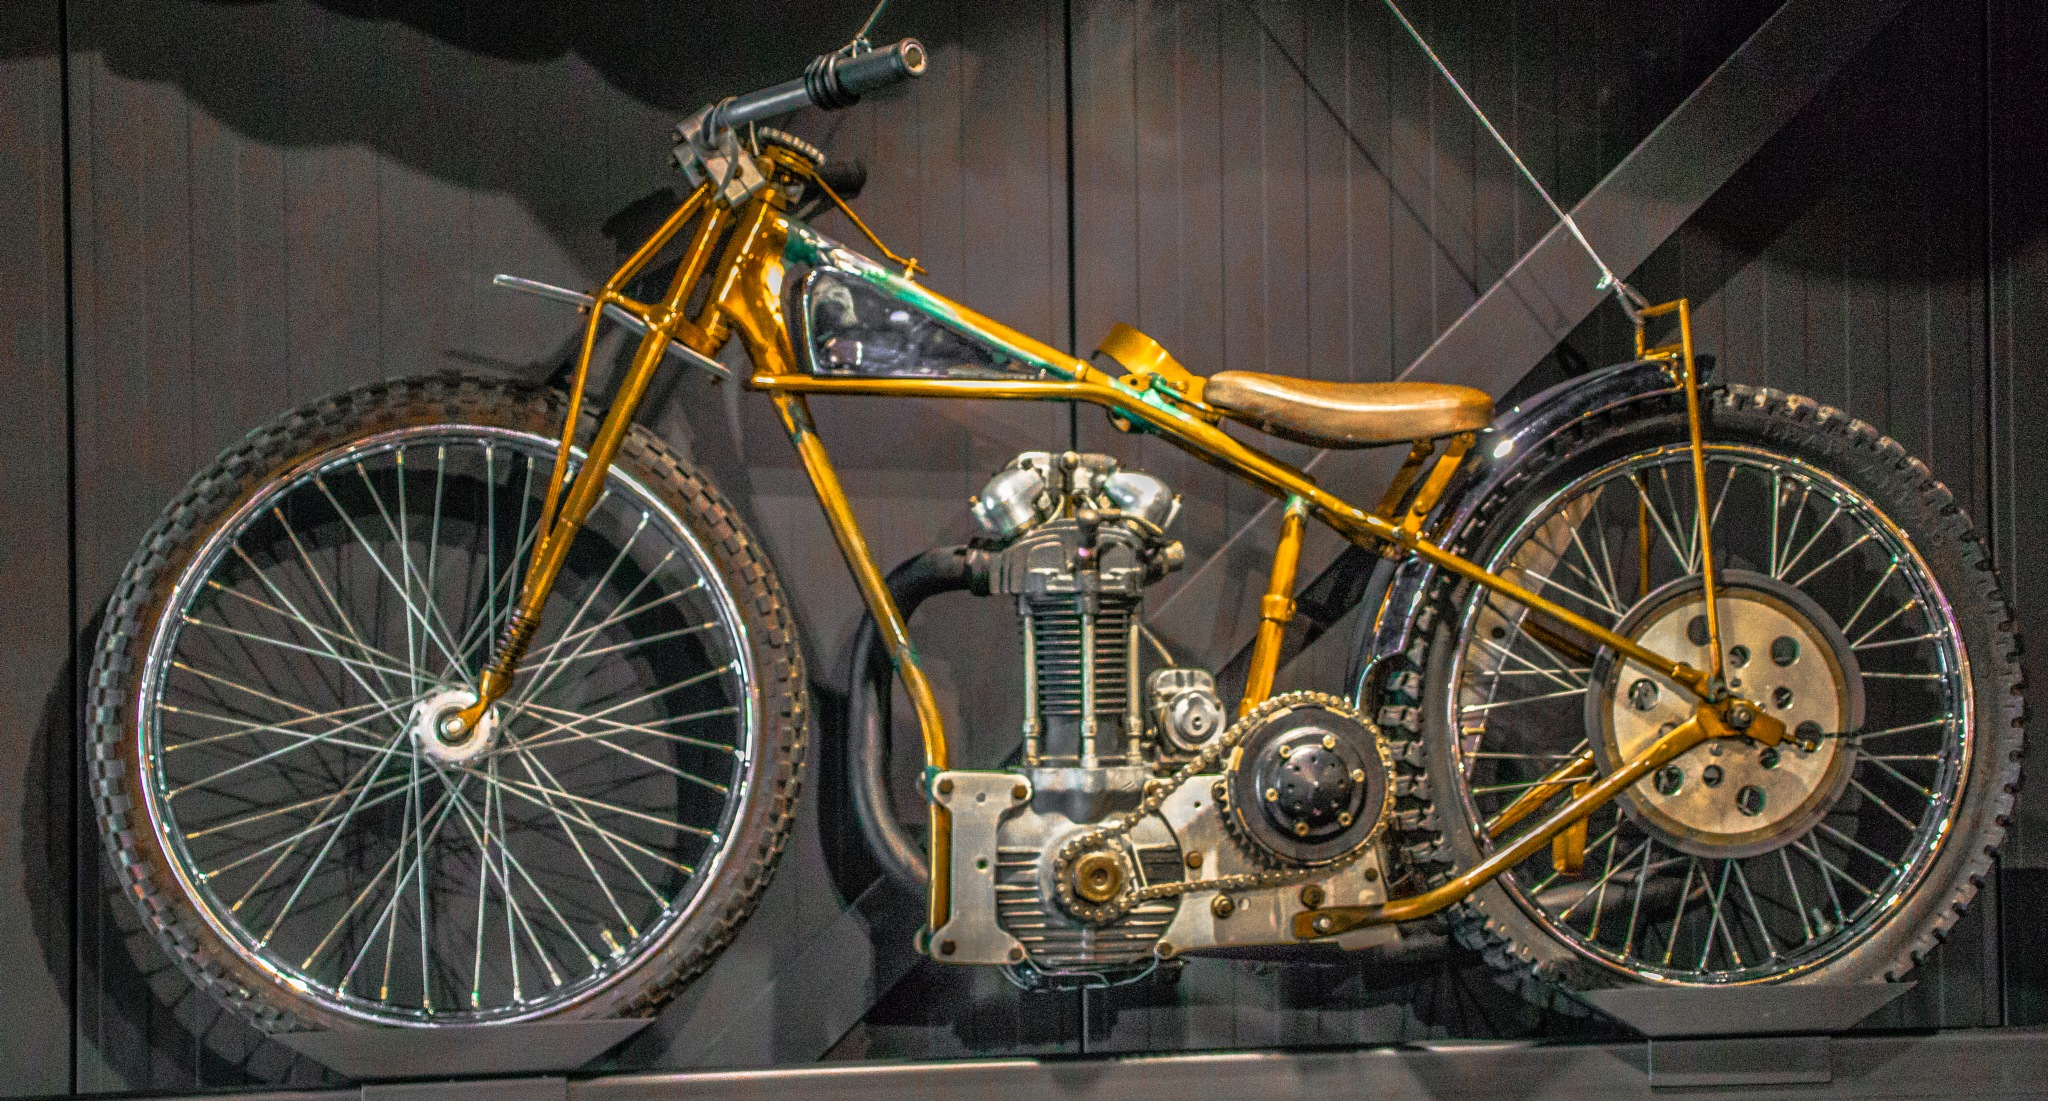 1939 697cc OHV Mosley Speedway Bike by george.mcmenemy.7